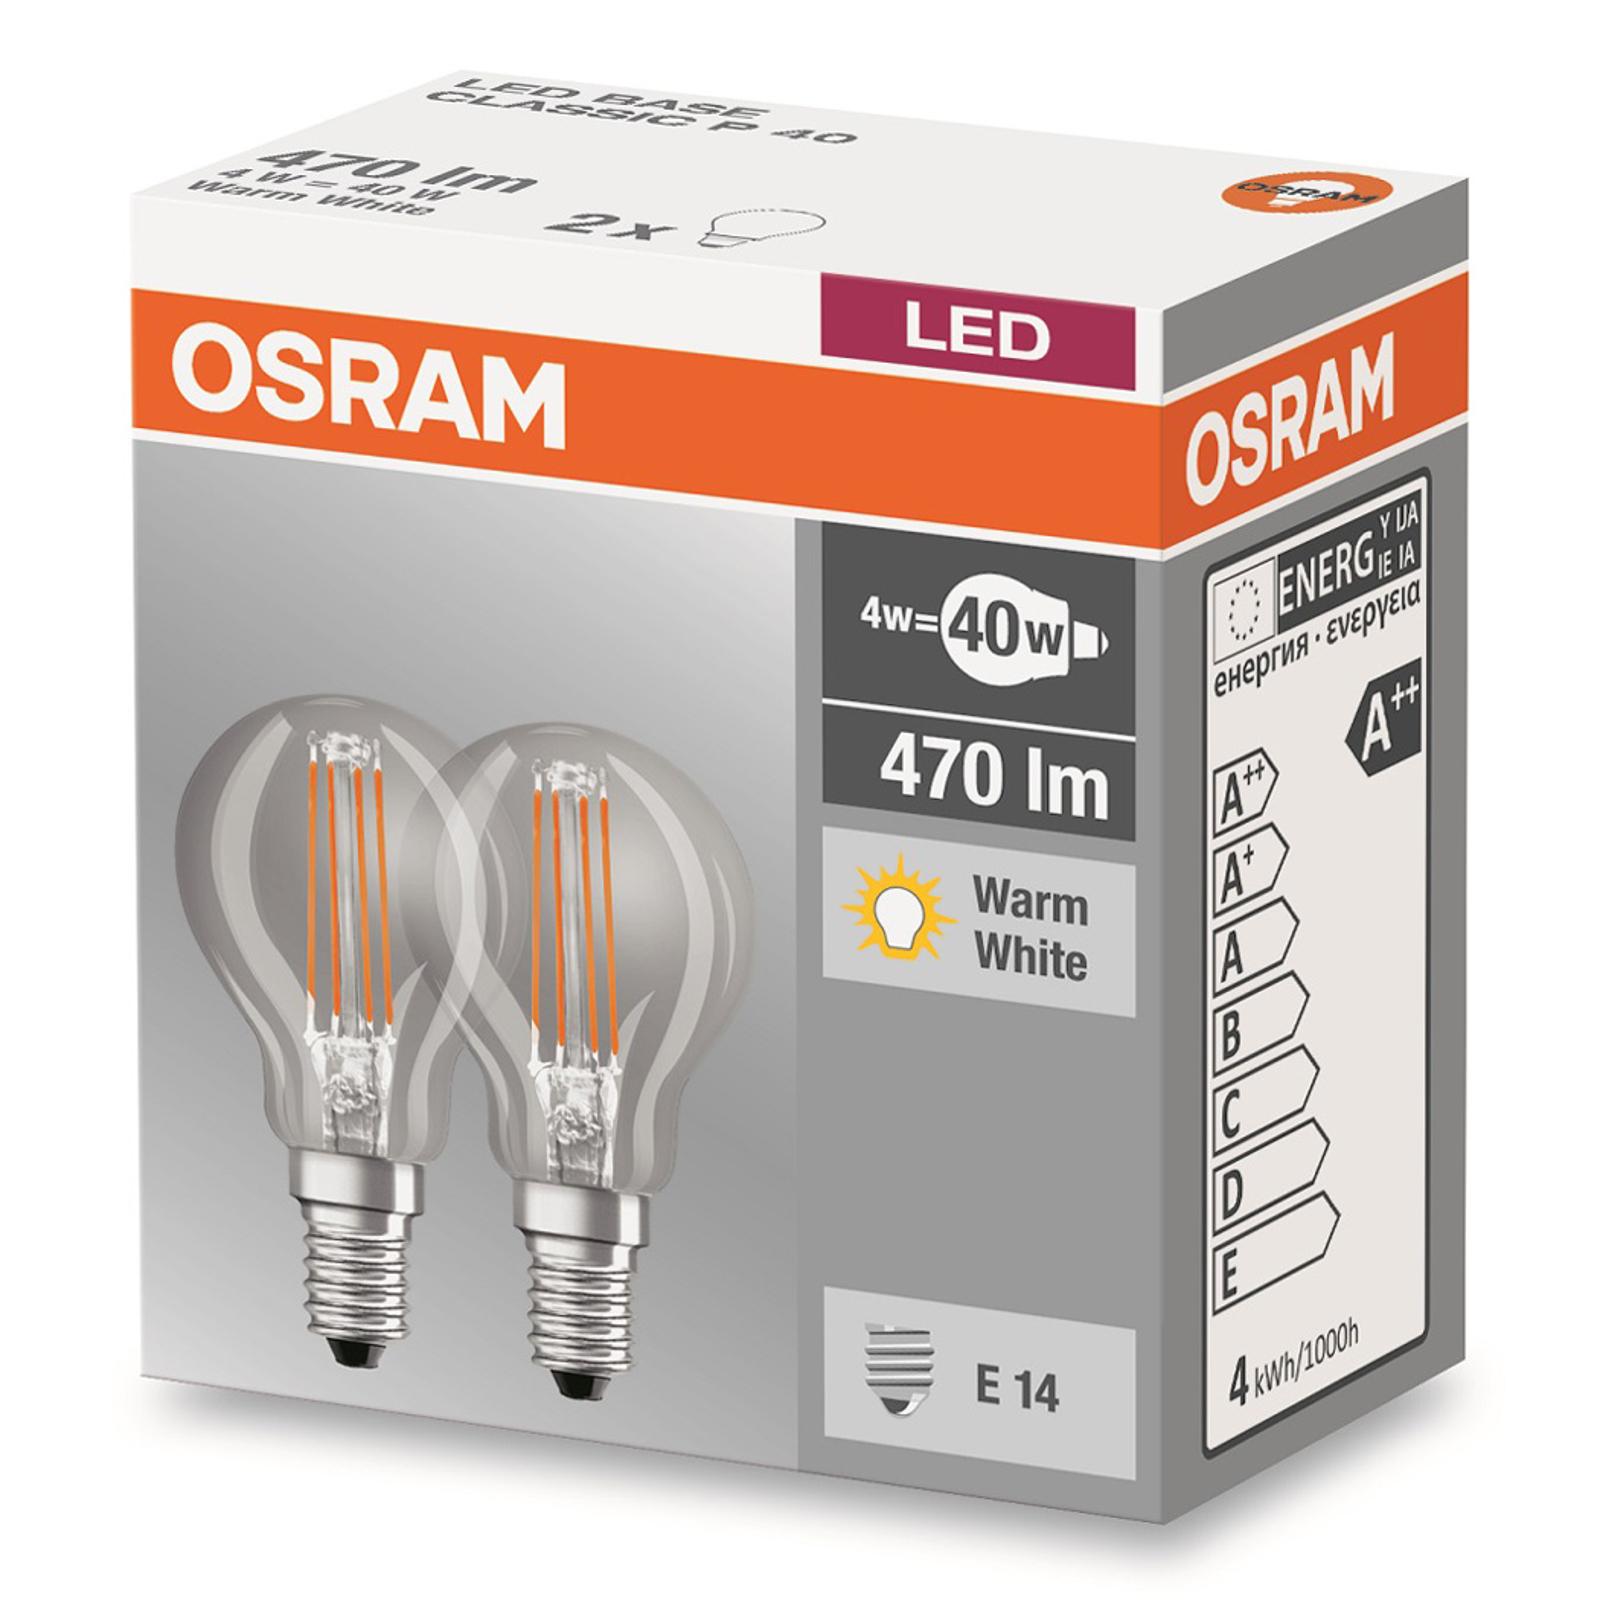 E14 4W 827 LED-dråpepære i sett på 2